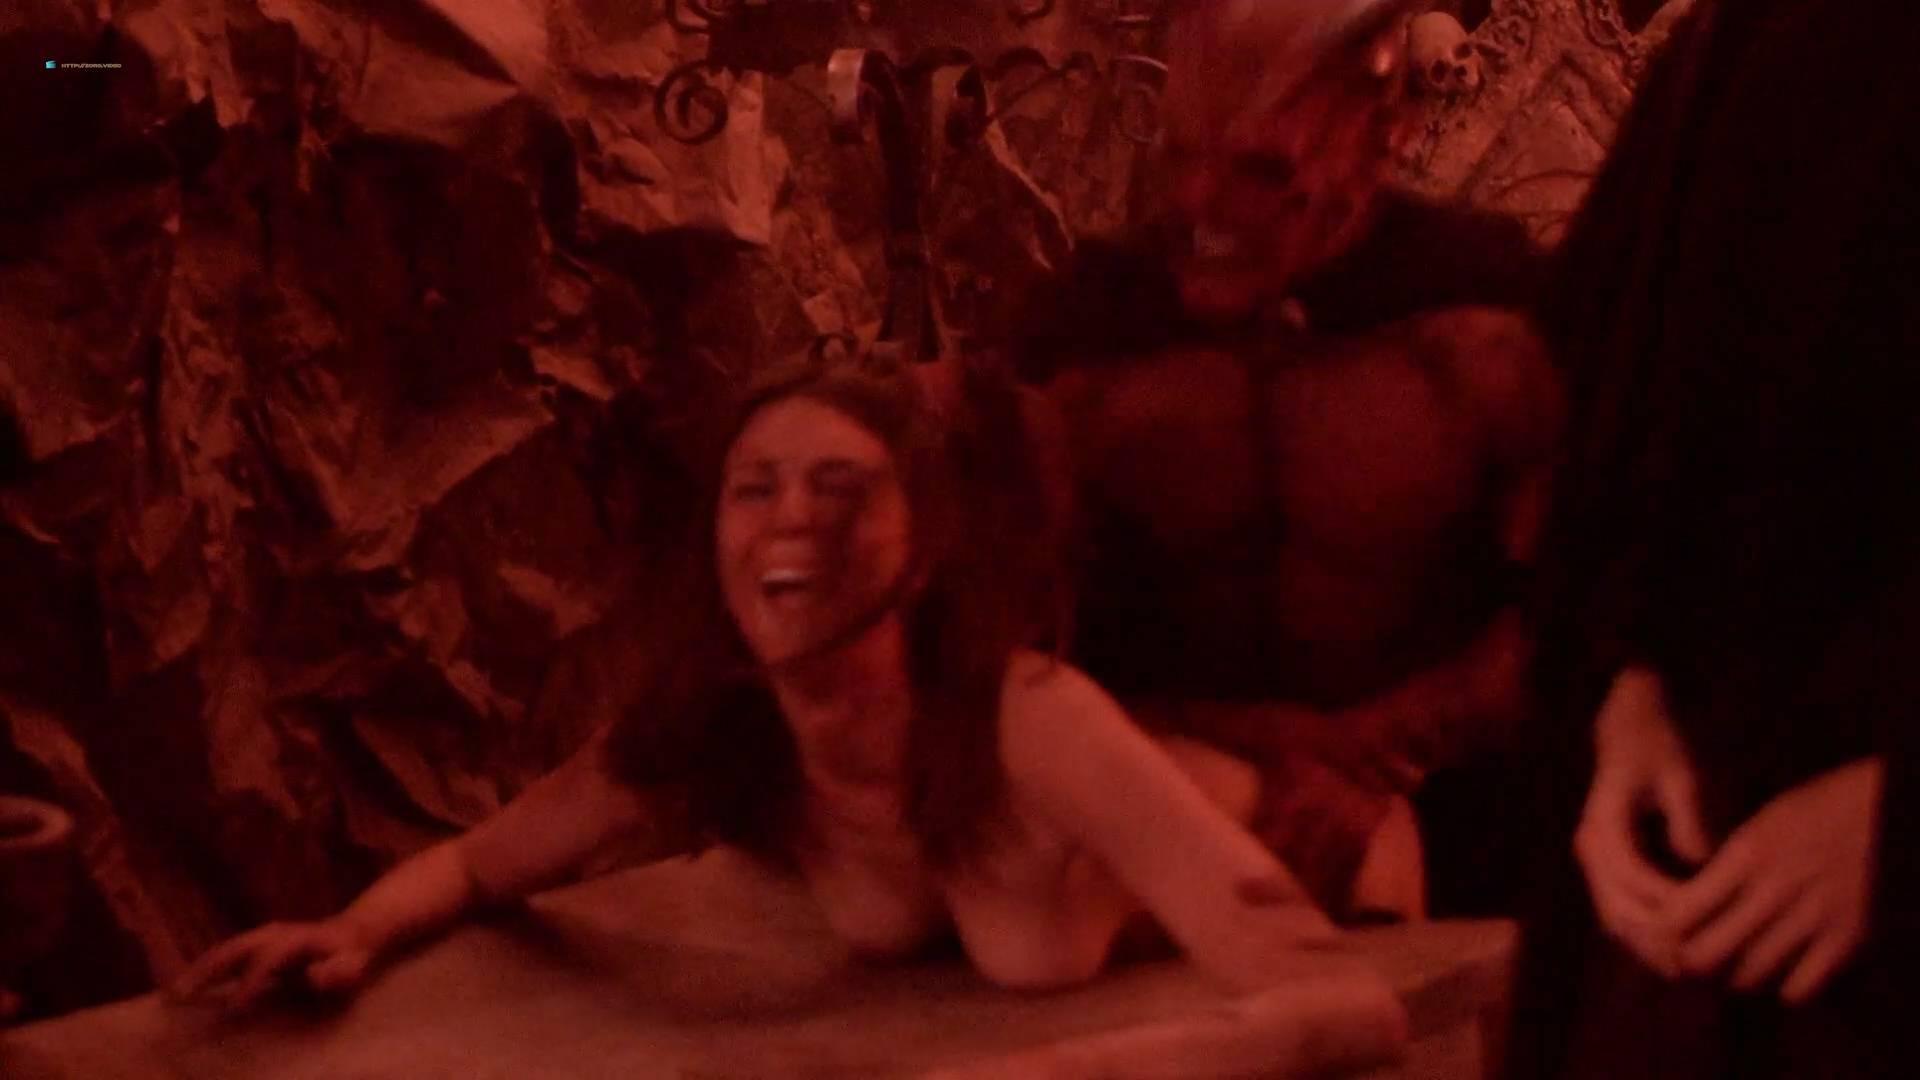 Anja Ali Samantha Lesbian Porn samantha stewart nude sex doggy style - voodoo (2017) hd